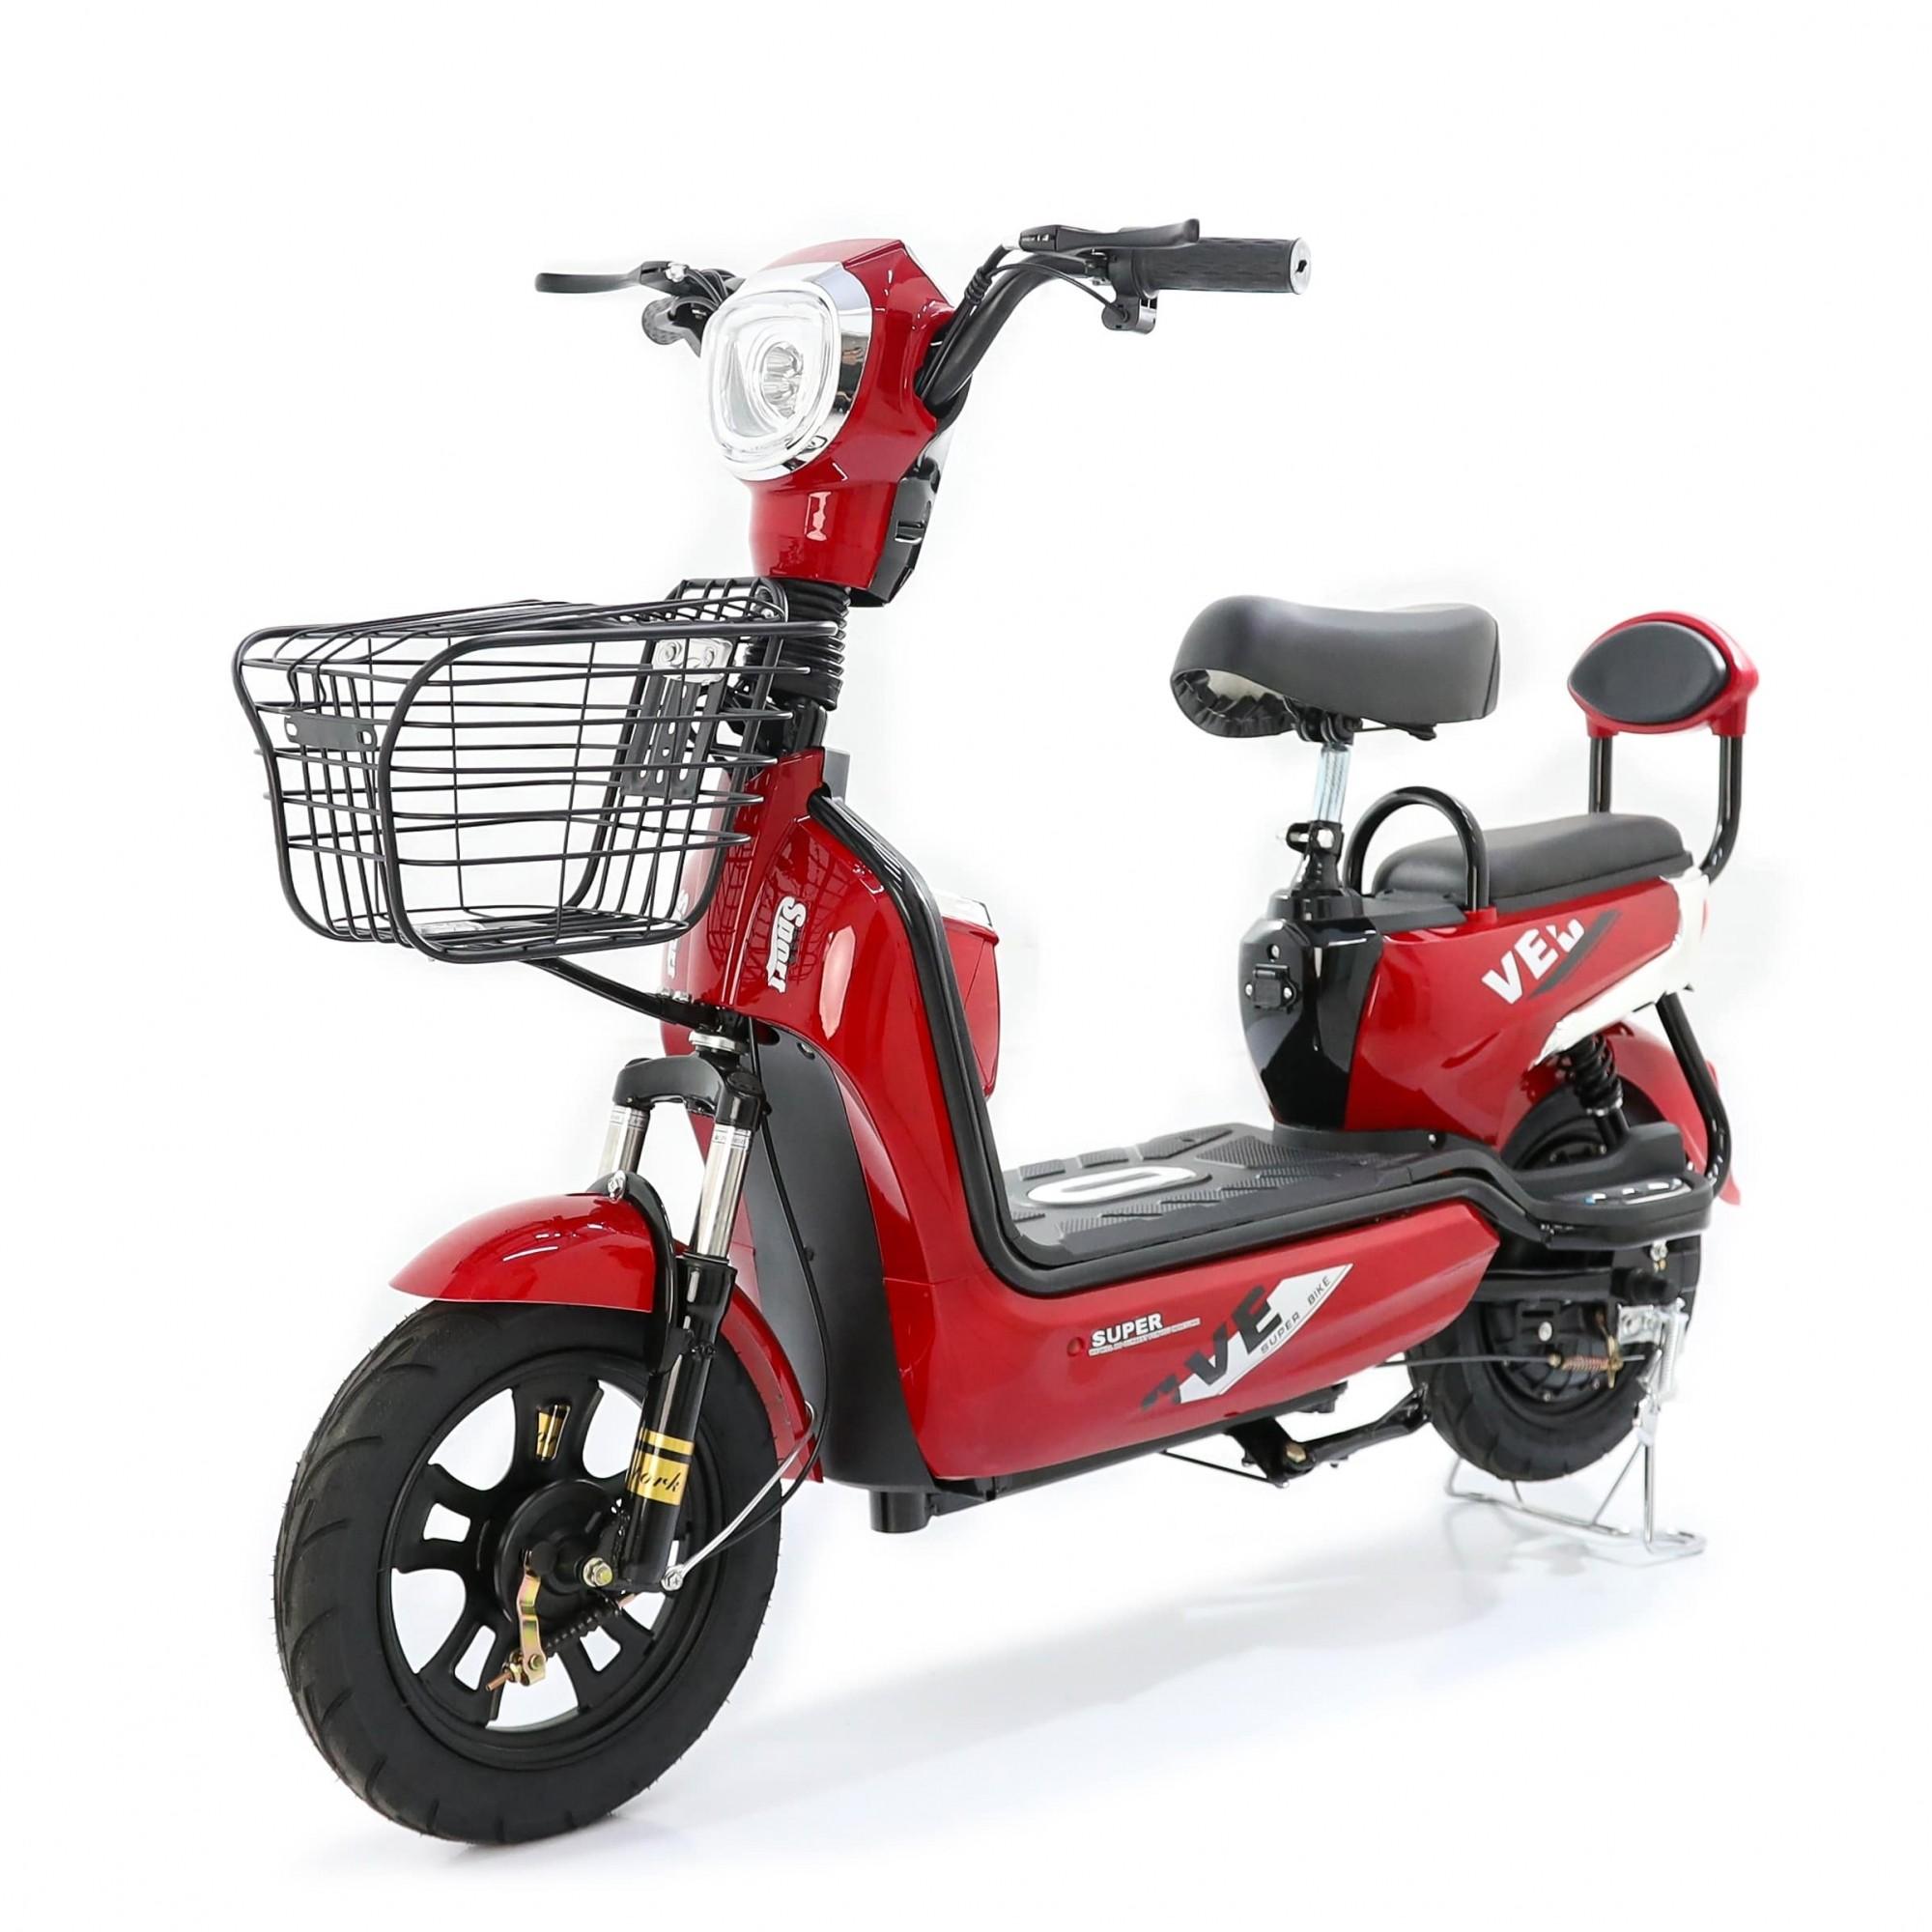 Scooter Patinete Elétrico Smart Ecobikes 350w 48v 12ah